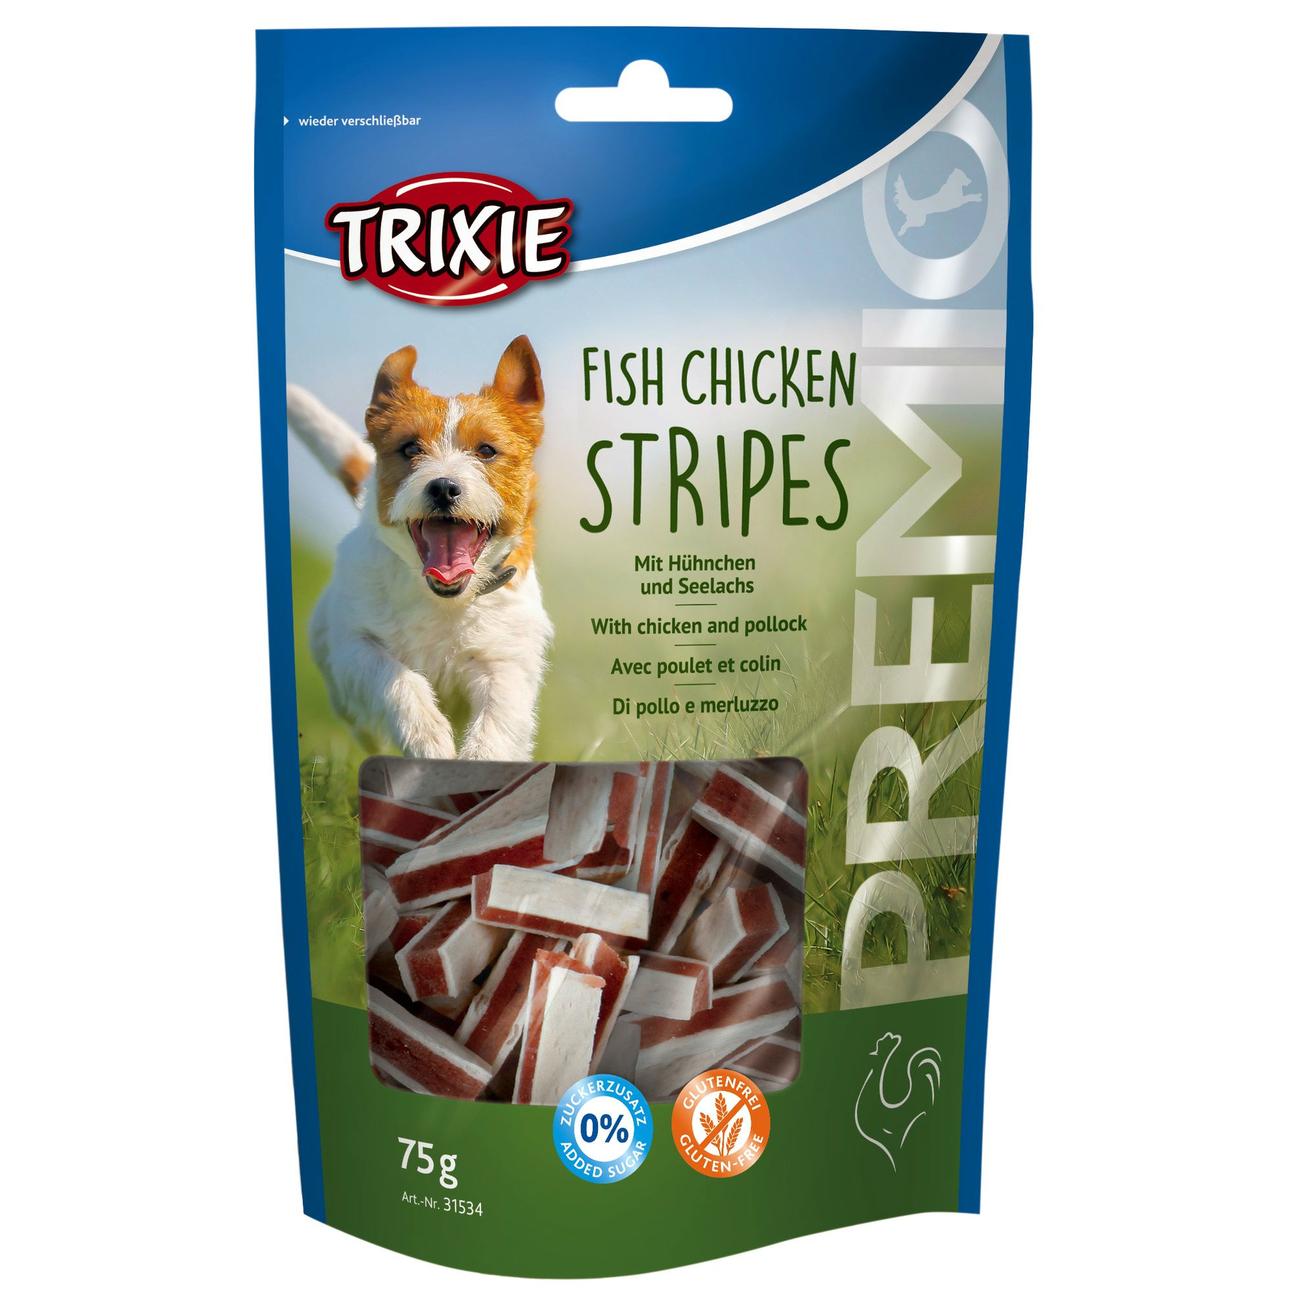 Trixie Premio Fish Chicken Hundesnack 31535, Bild 3